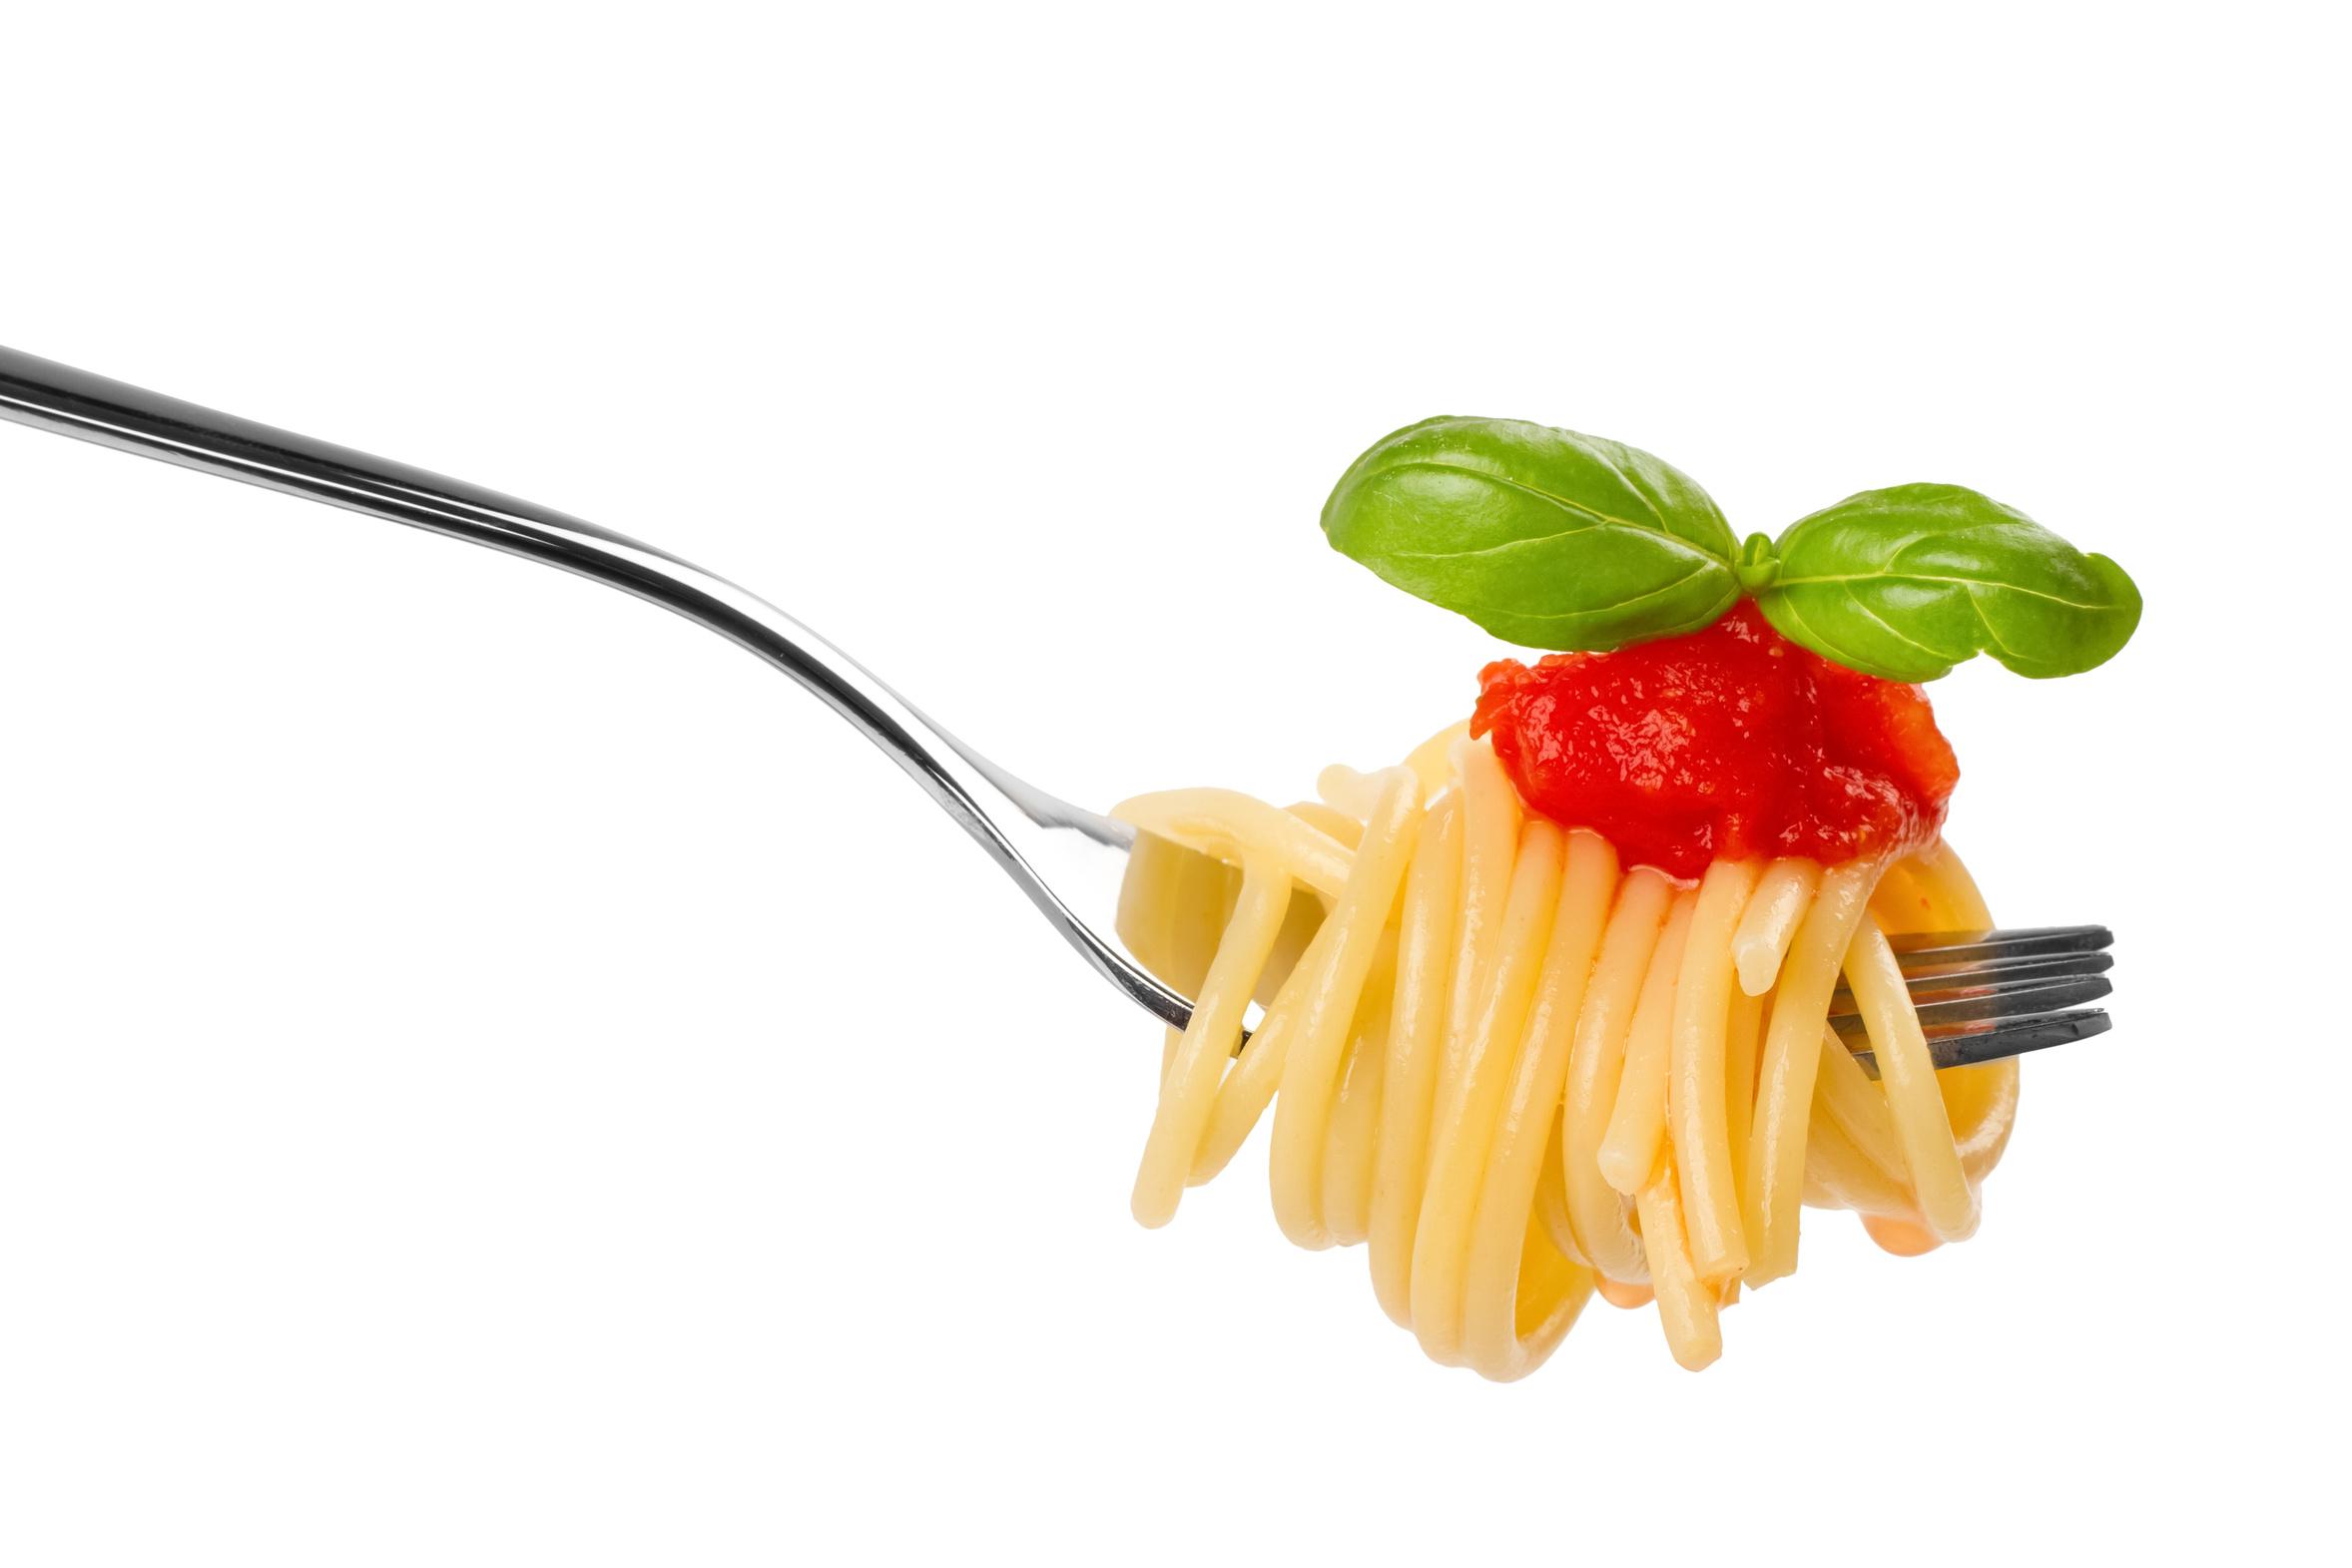 cc5a6cf5465c L e-commerce gourmet  specialità a portata di clic